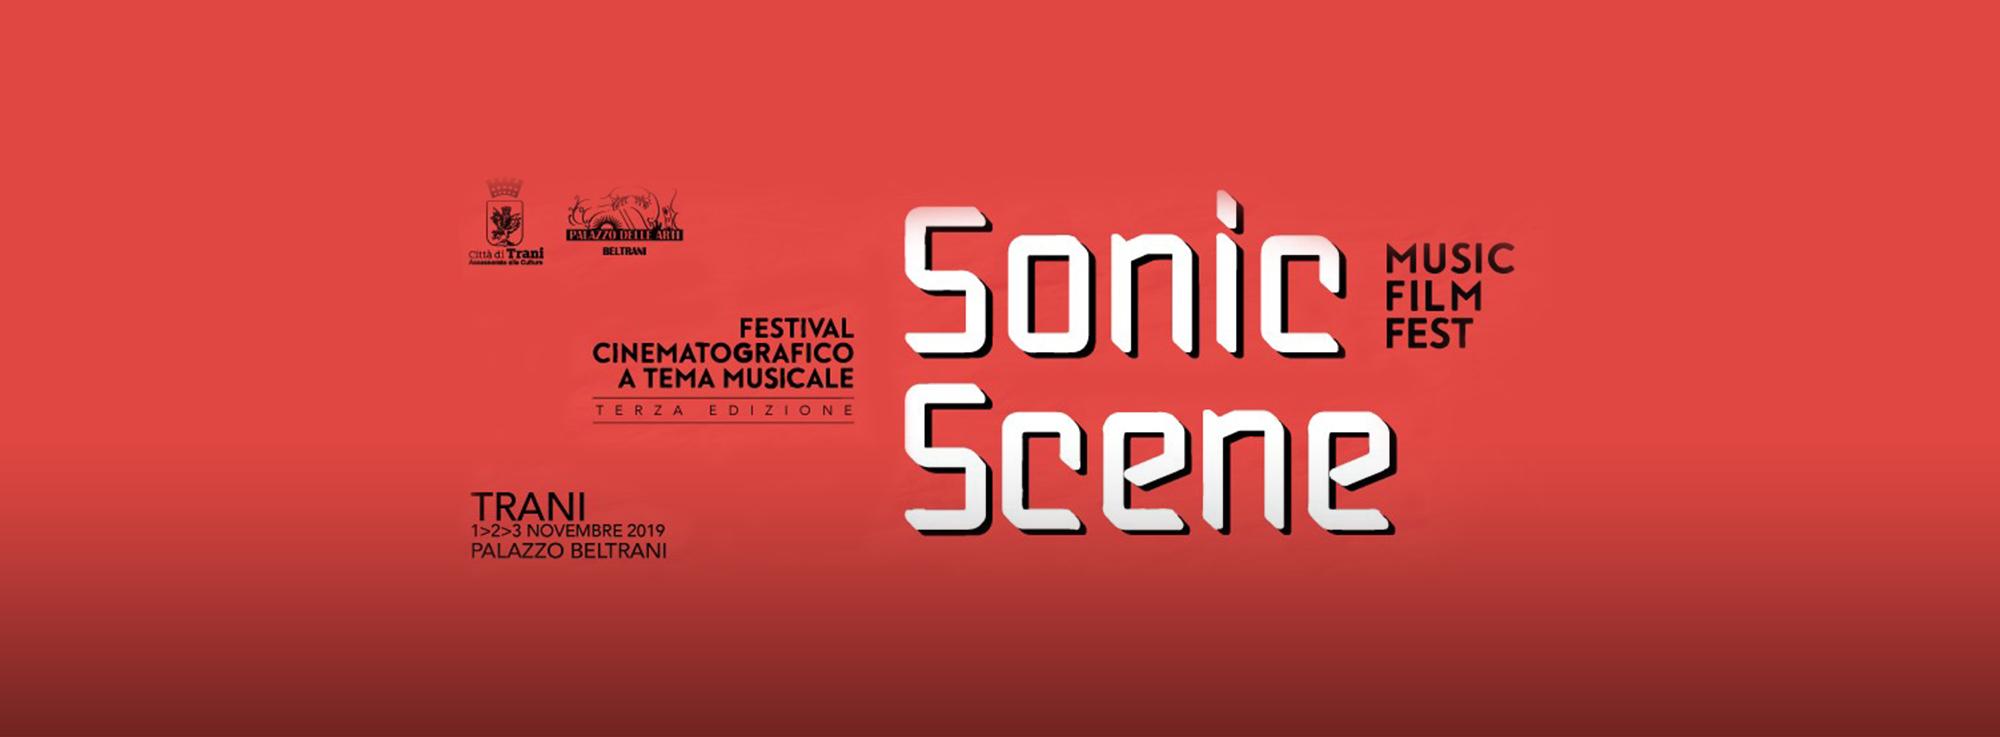 Trani: Sonic Scene Music Film Fest